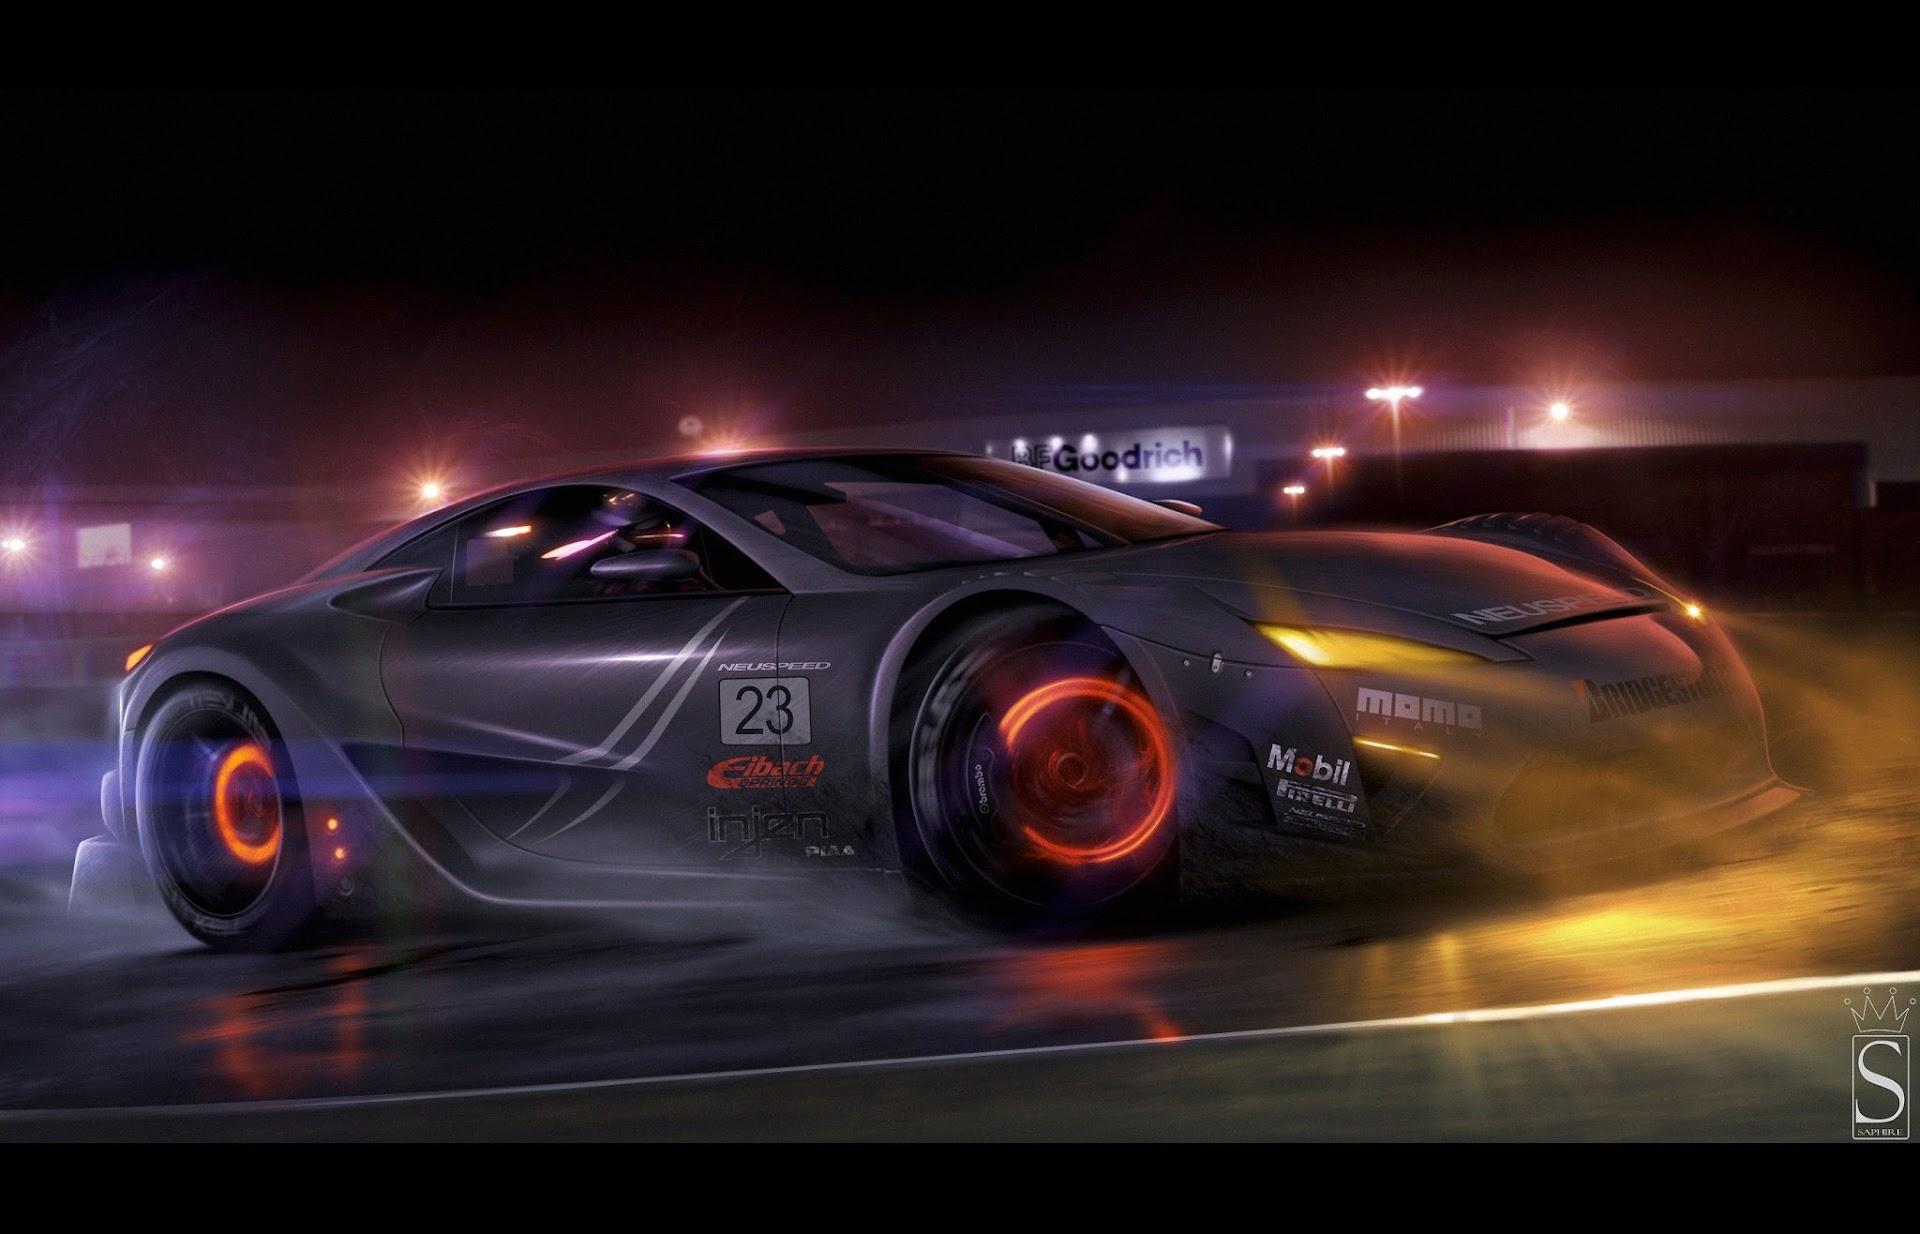 Papel De Parede Super Carros Tunados Esportivos